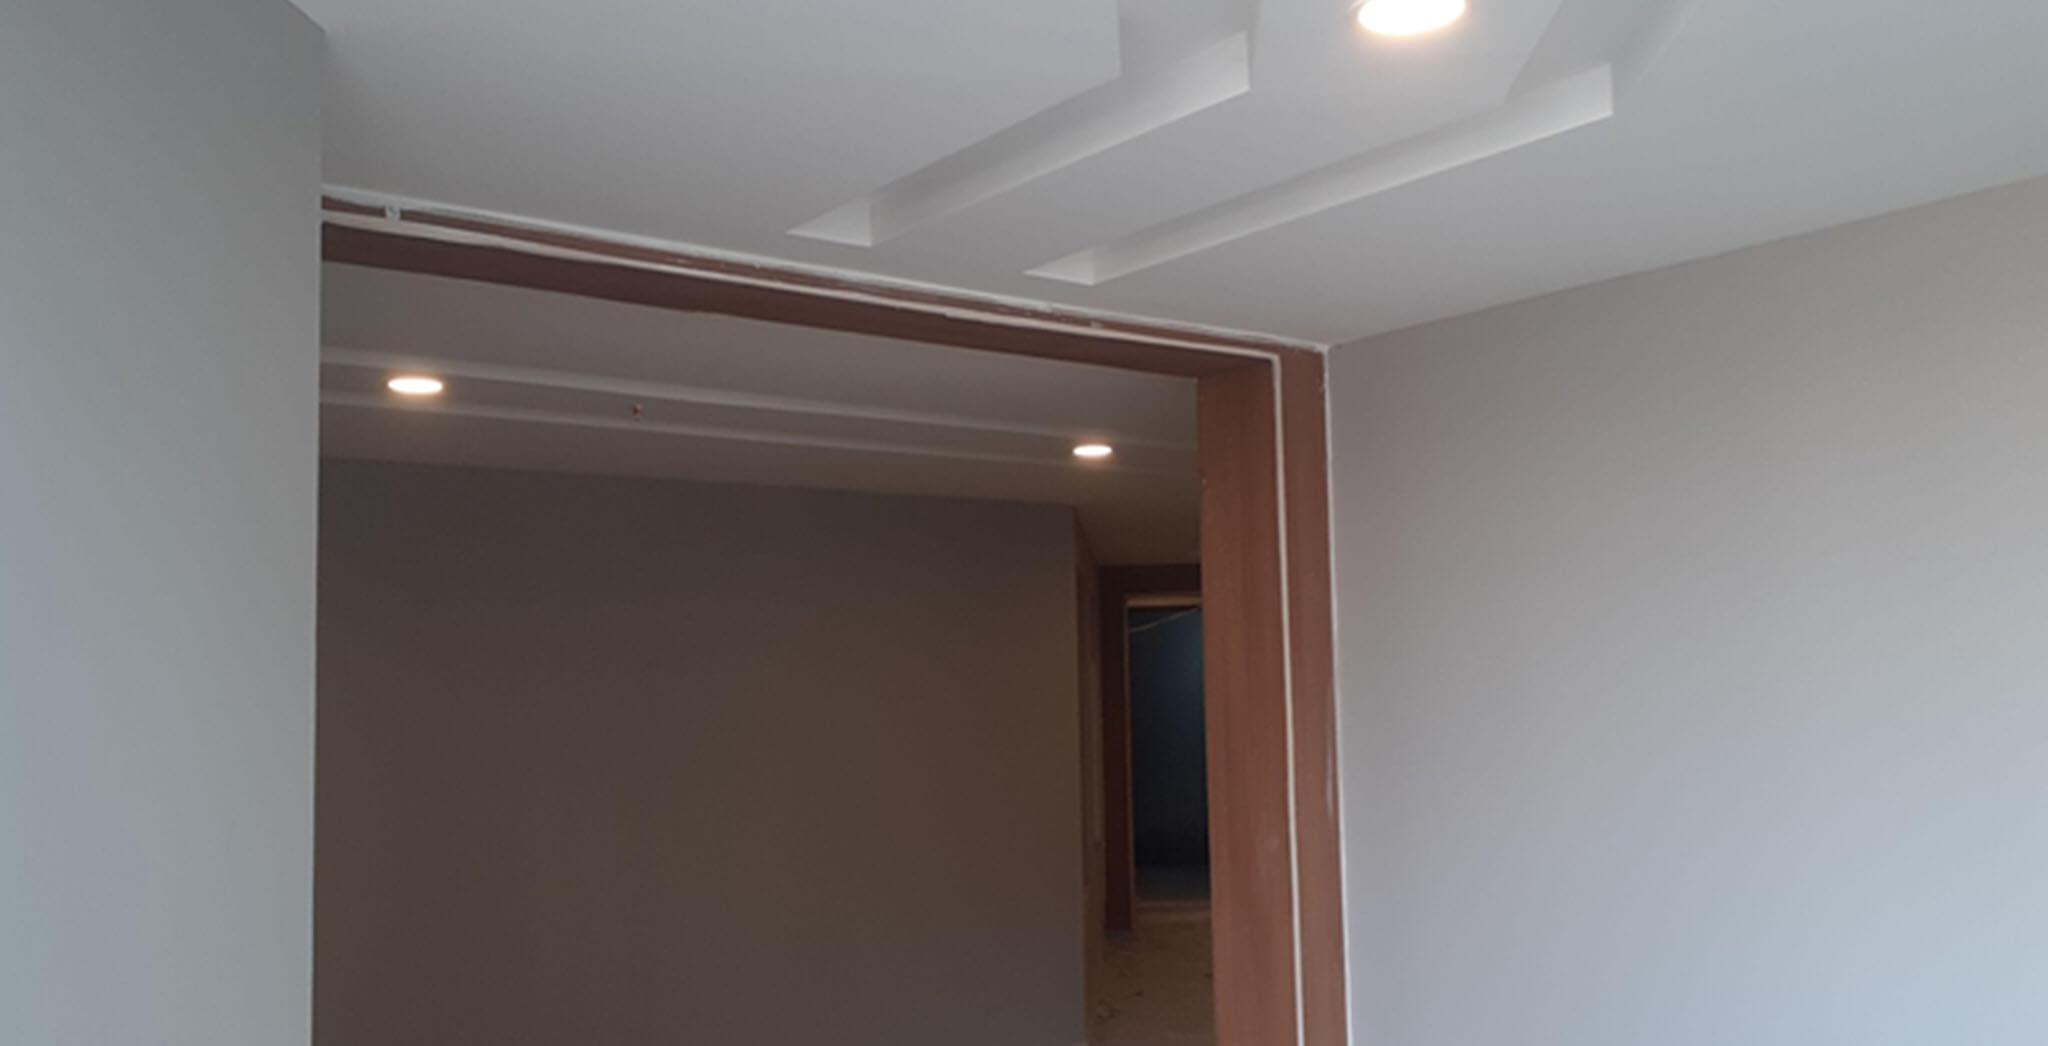 Jul 2020 - Towers B, C & D basement: Entrance lobby finishing work-in-progress